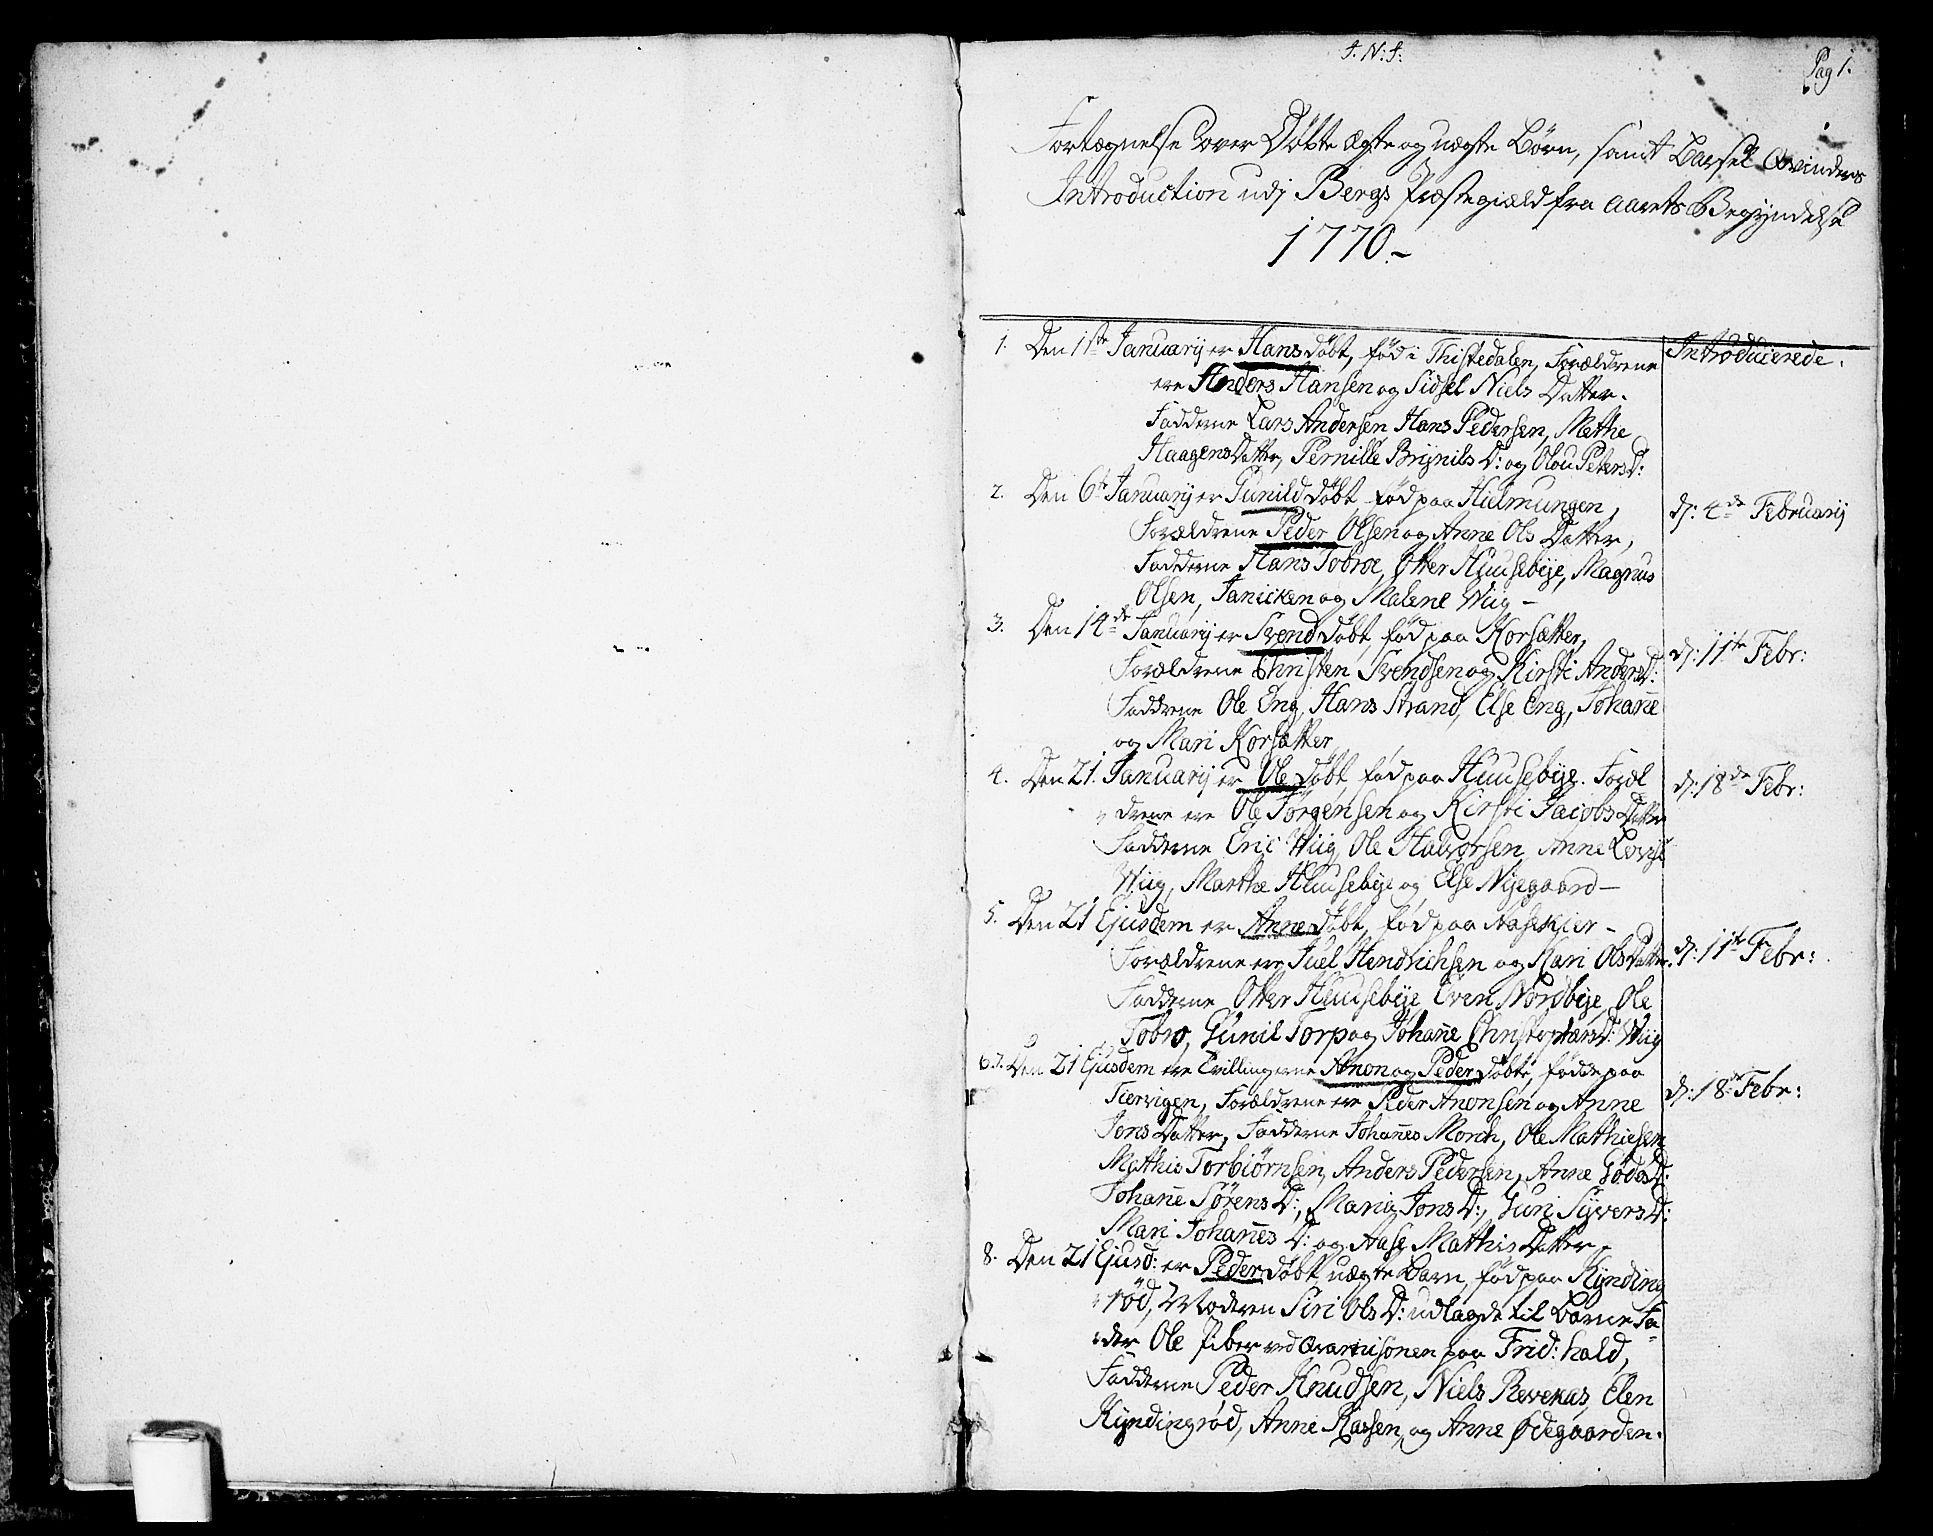 SAO, Berg prestekontor Kirkebøker, F/Fa/L0001: Parish register (official) no. I 1, 1770-1814, p. 1